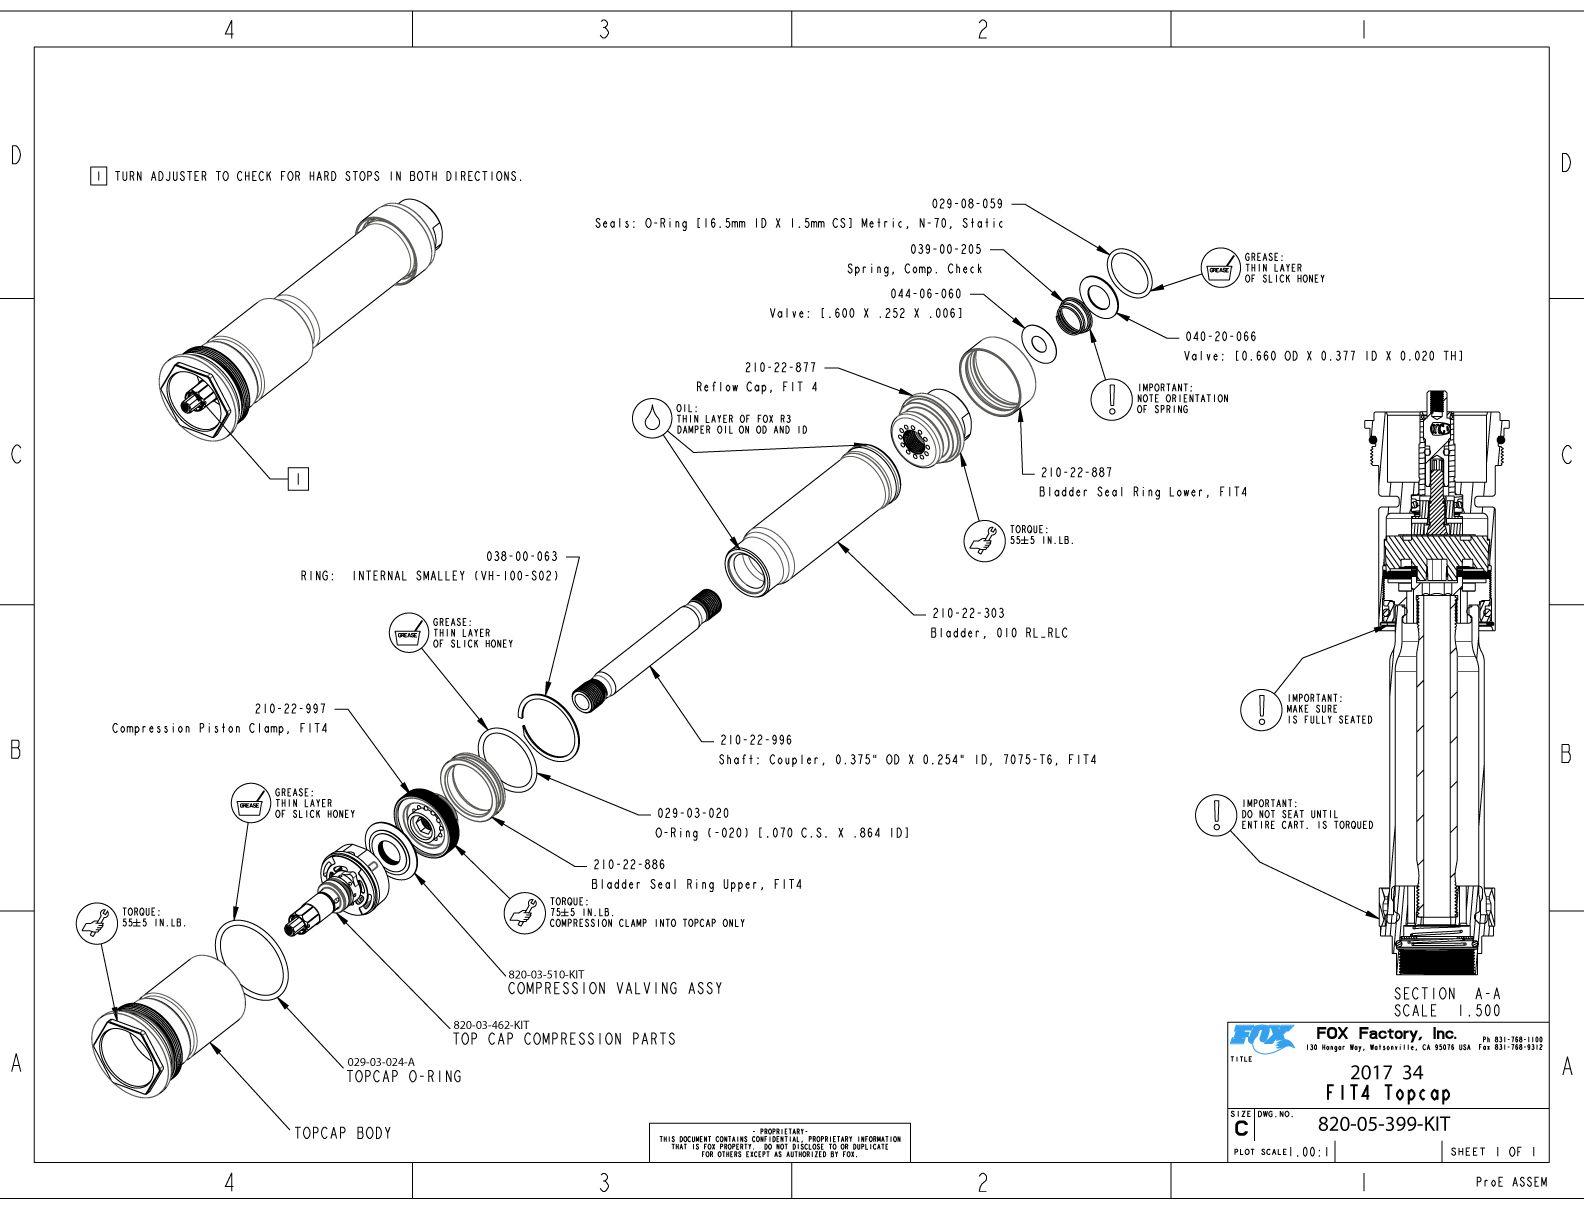 1999 Chrysler Town 038 Country 38 Digital Transmission Fuse Box Diagram